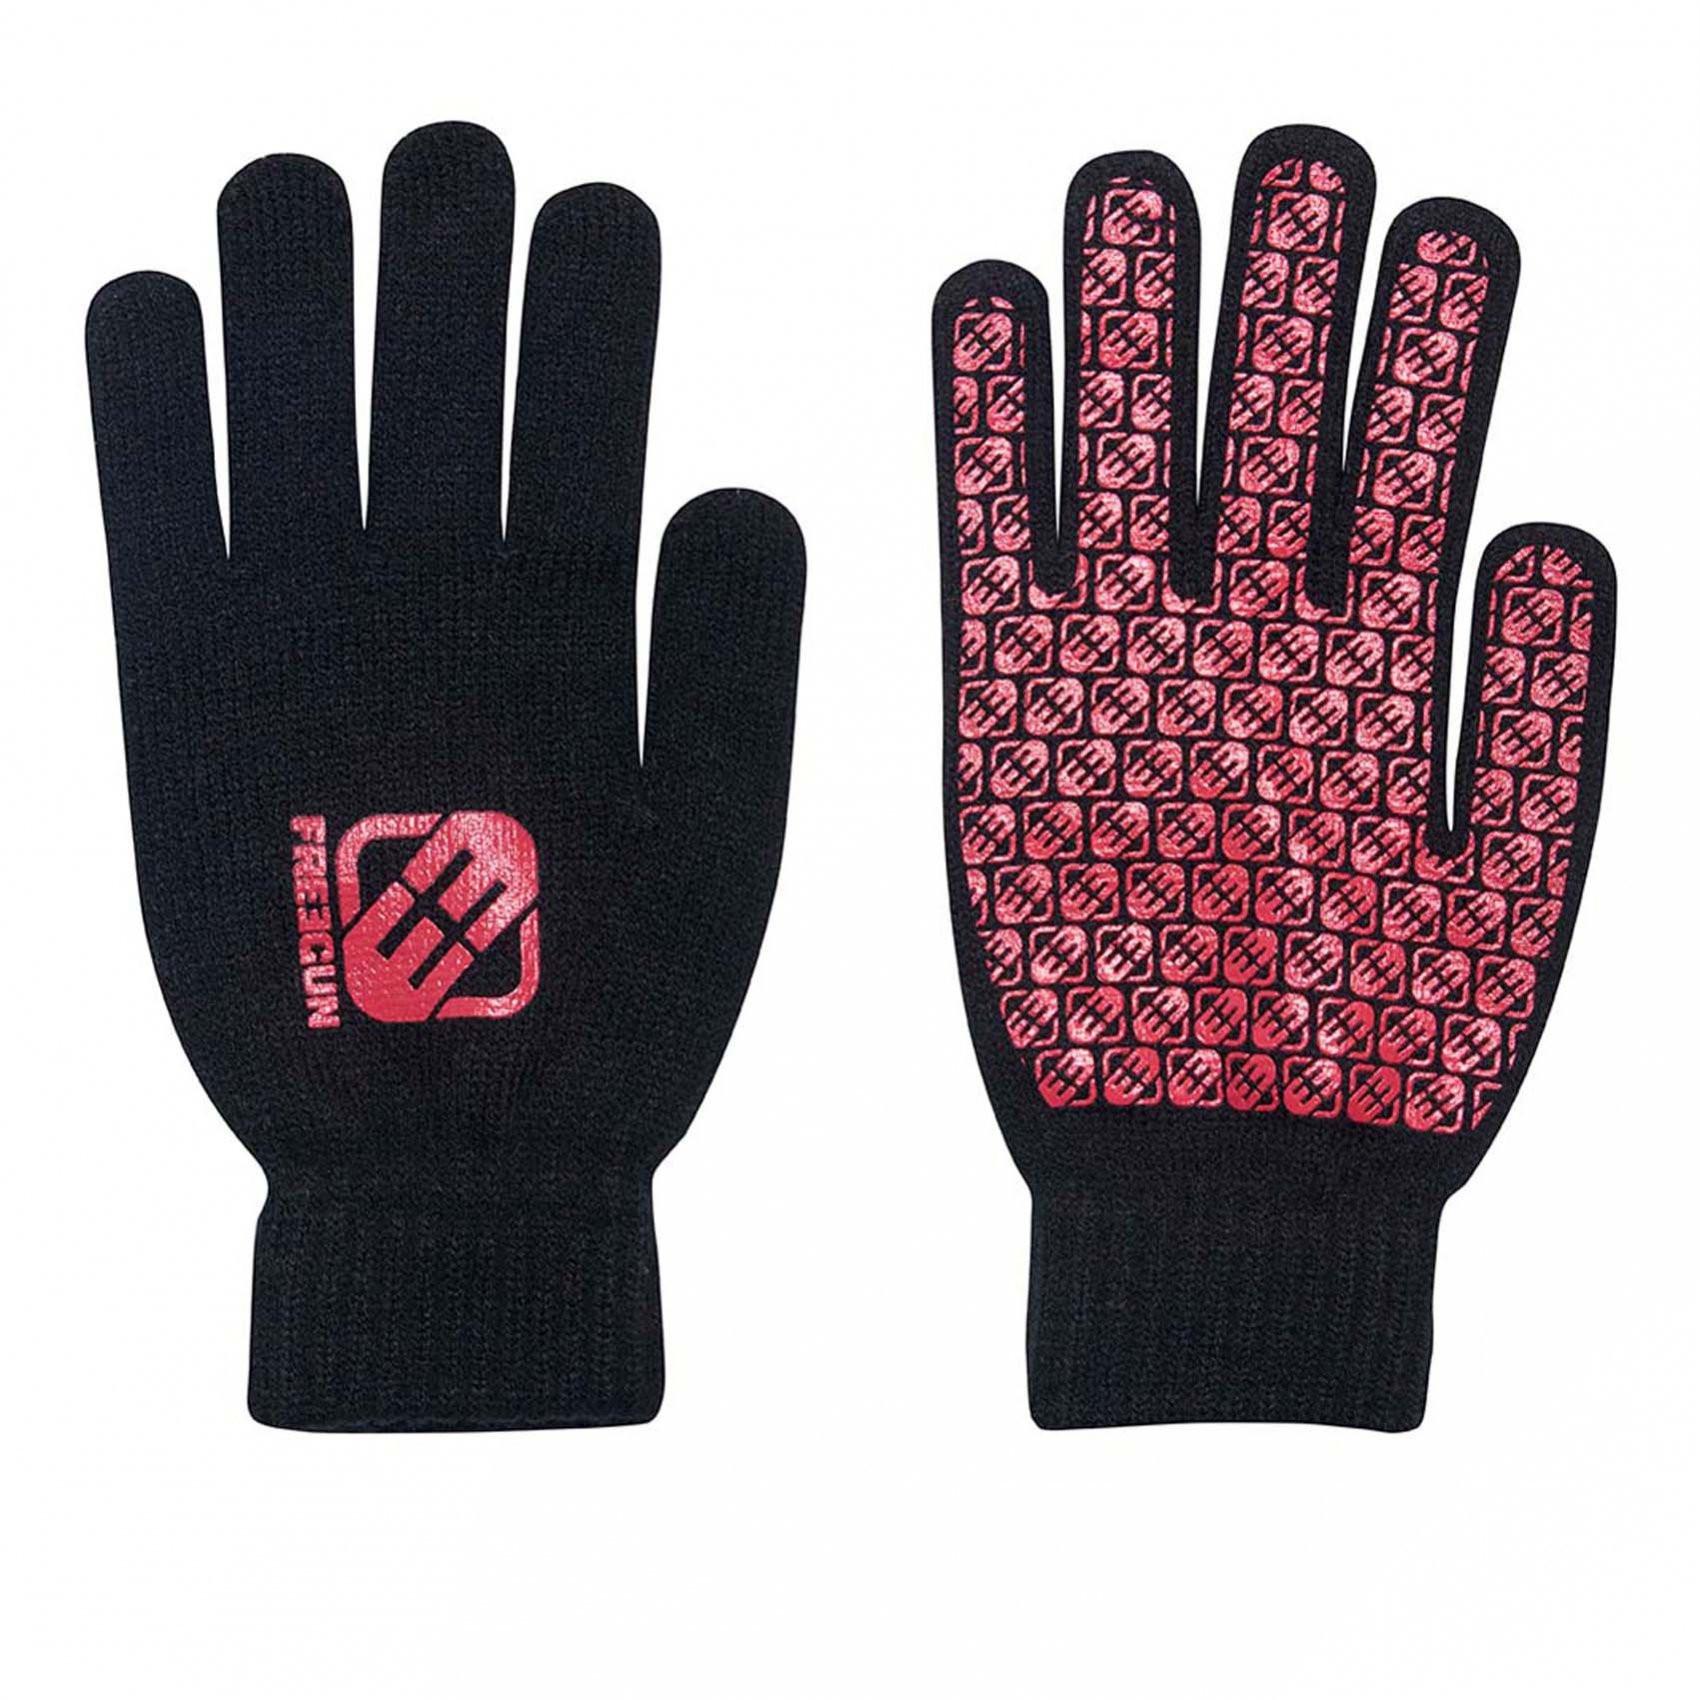 Paire de gants garçon logo rouge freegun (photo)